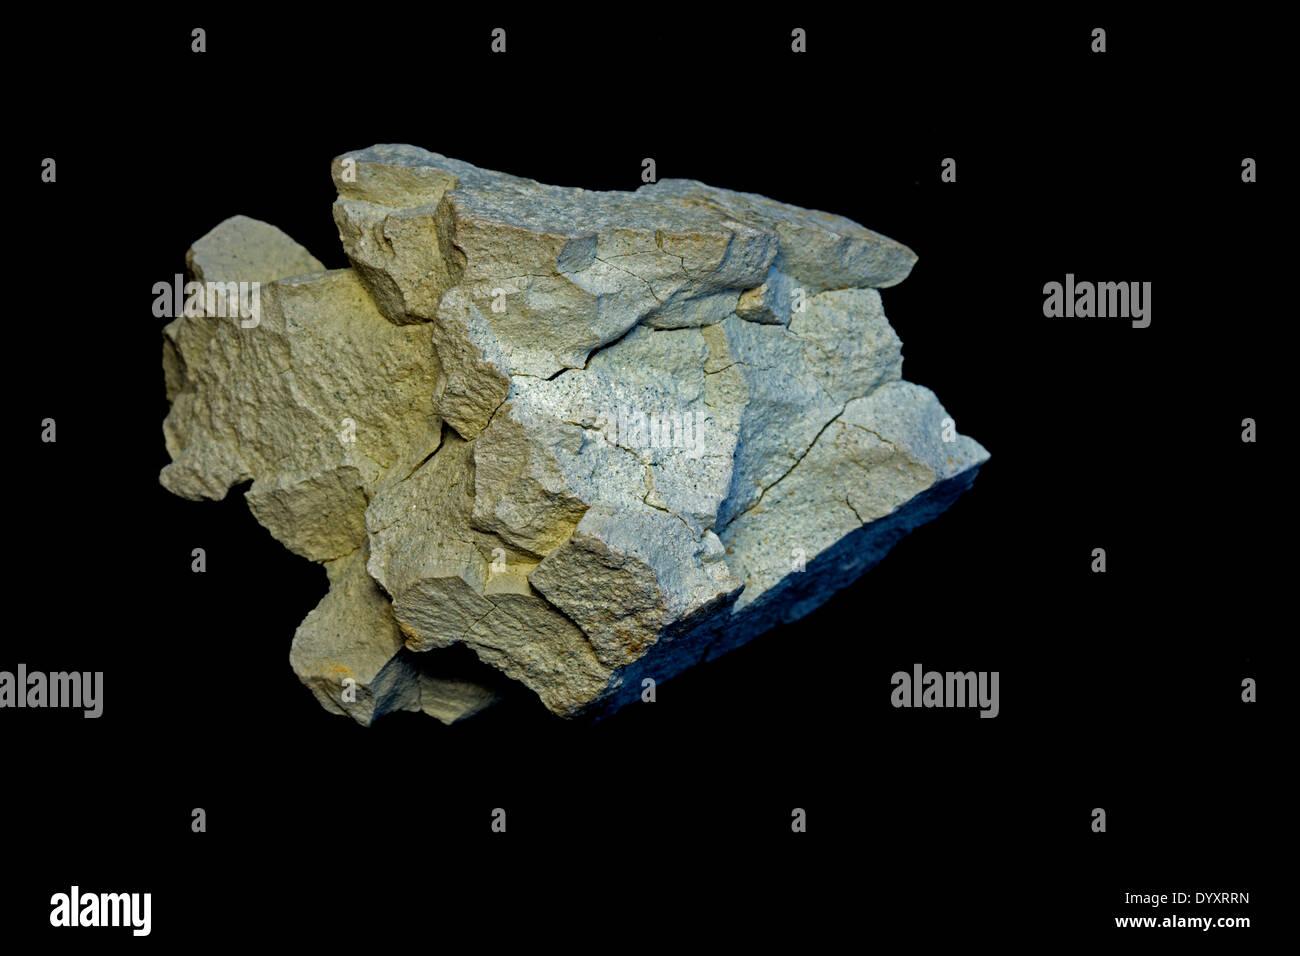 Bentonite, clay, Aberdeen, Mississippi, specimen courtesy of USGS - Stock Image